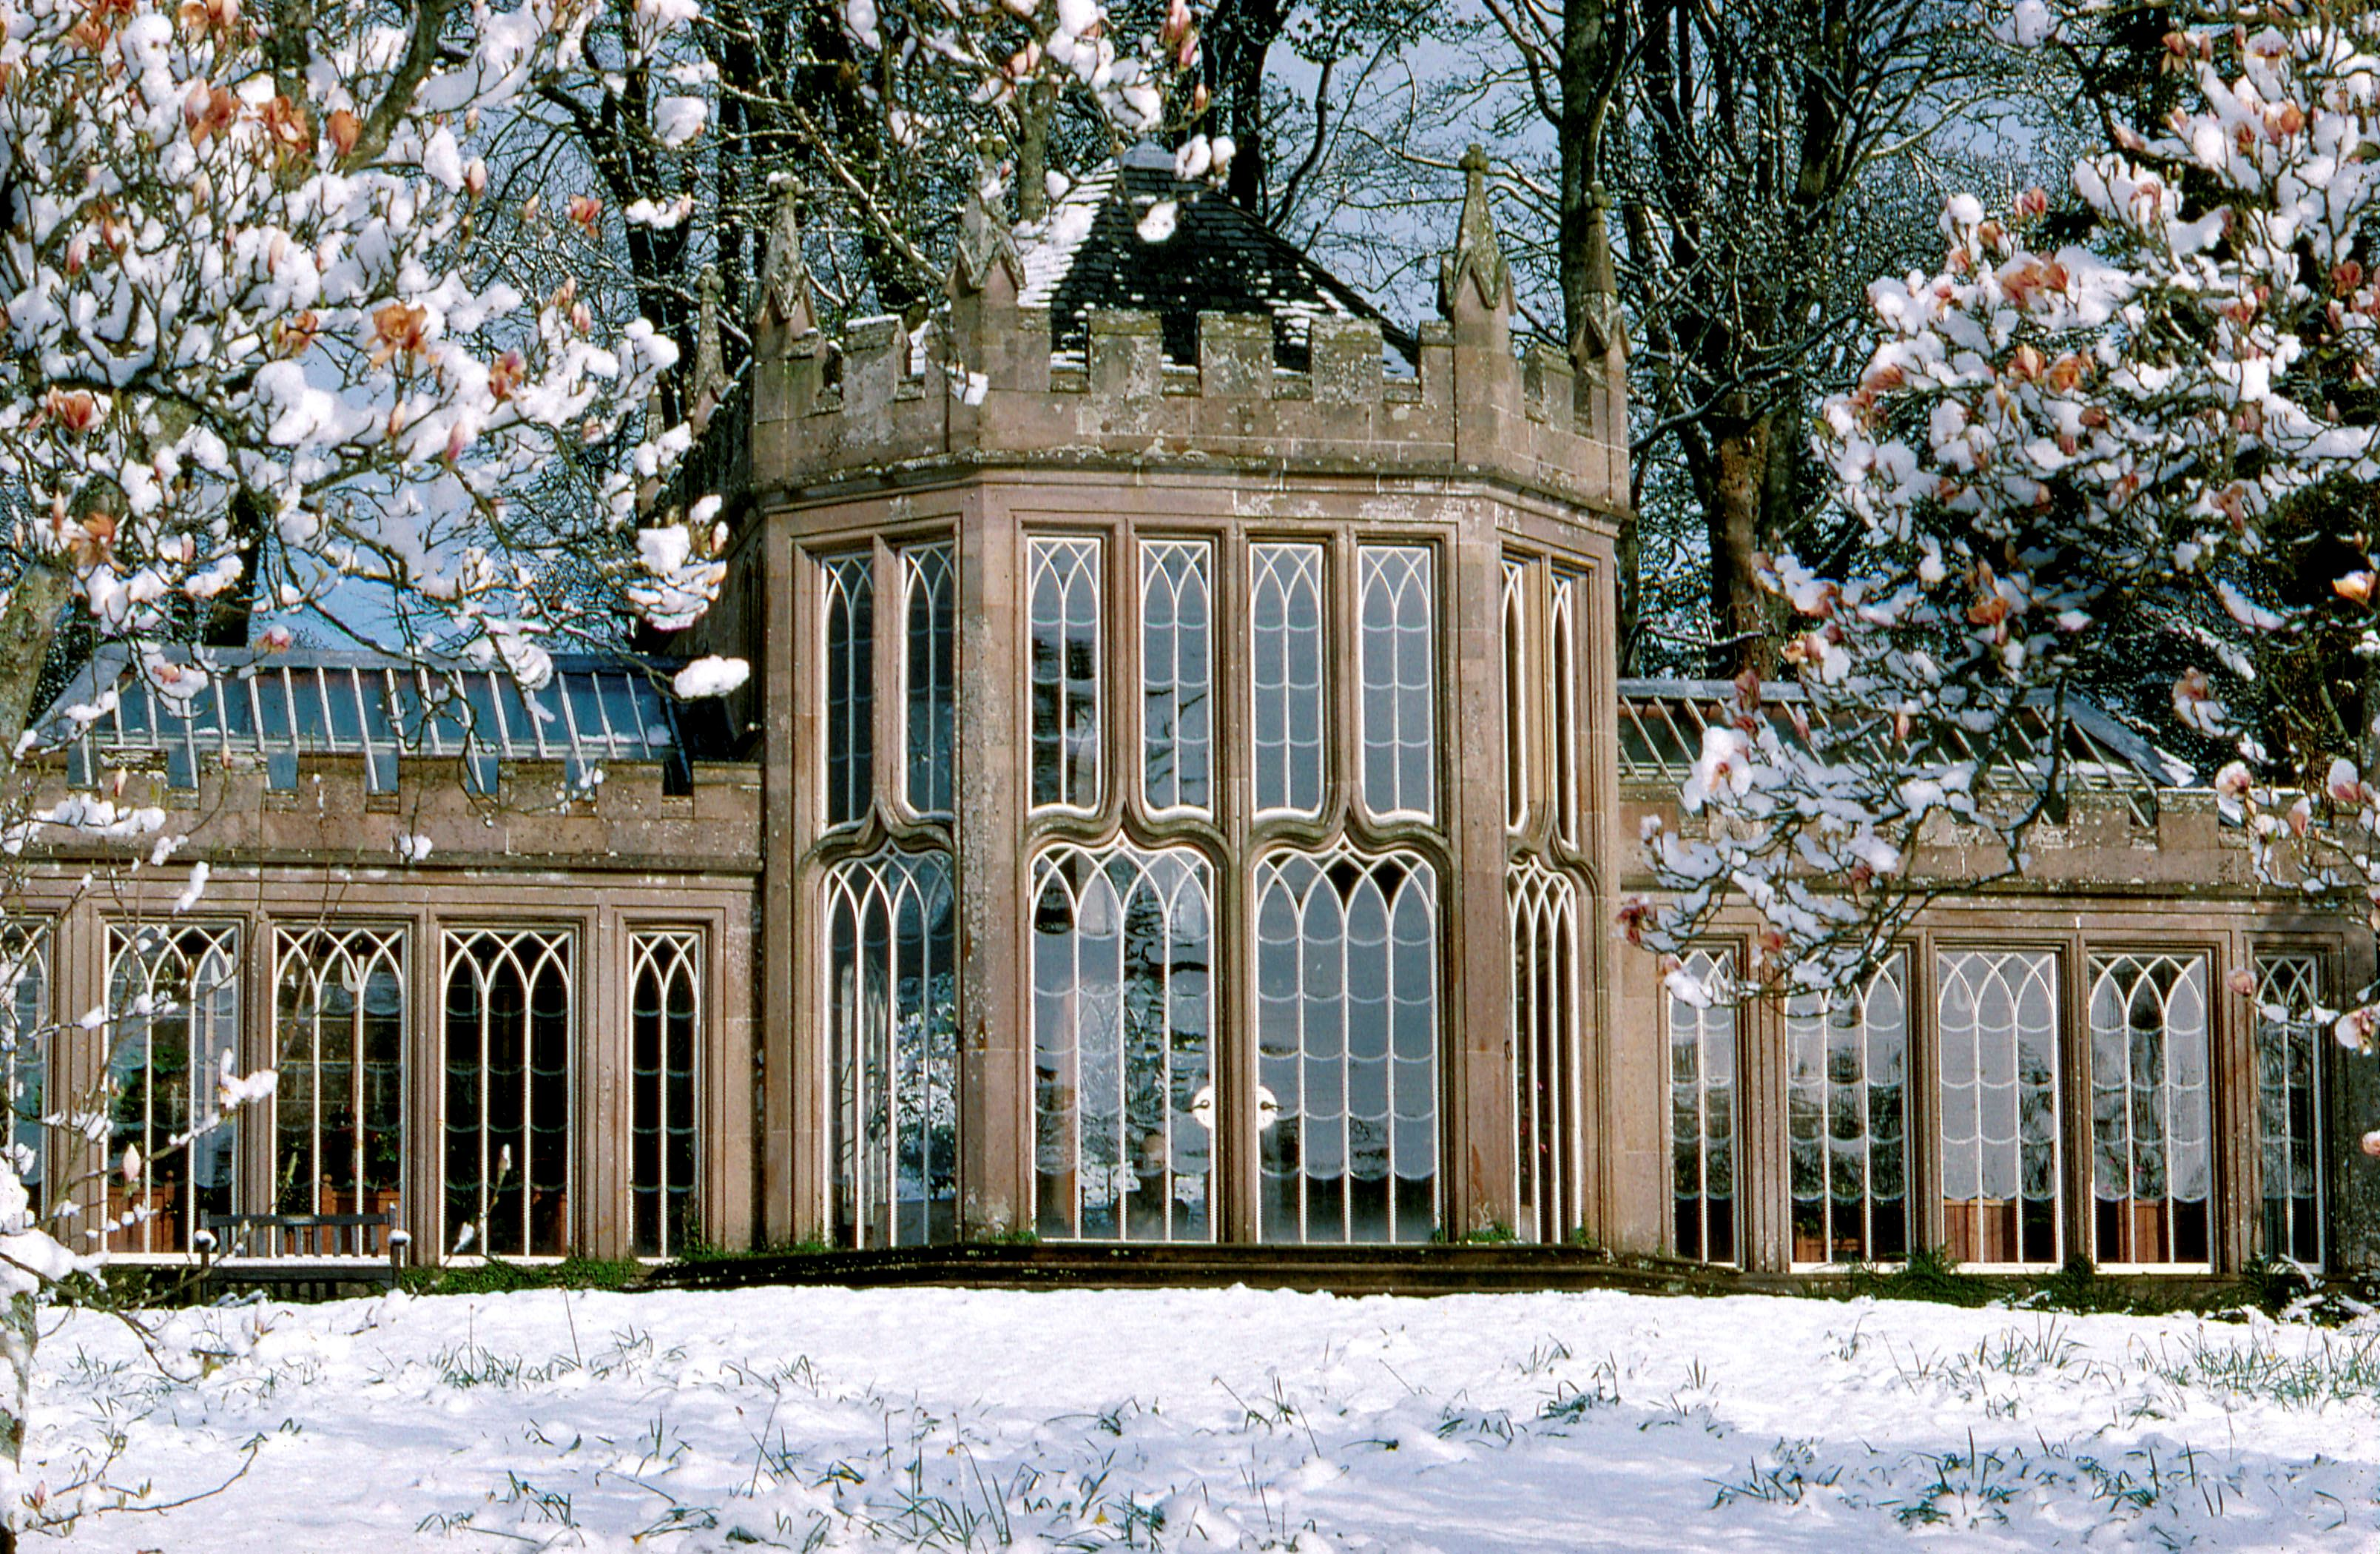 https://www.worldclassweddingvenues.com/Images/worldclassweddingvenues/cam_house_in_the_snow.jpg